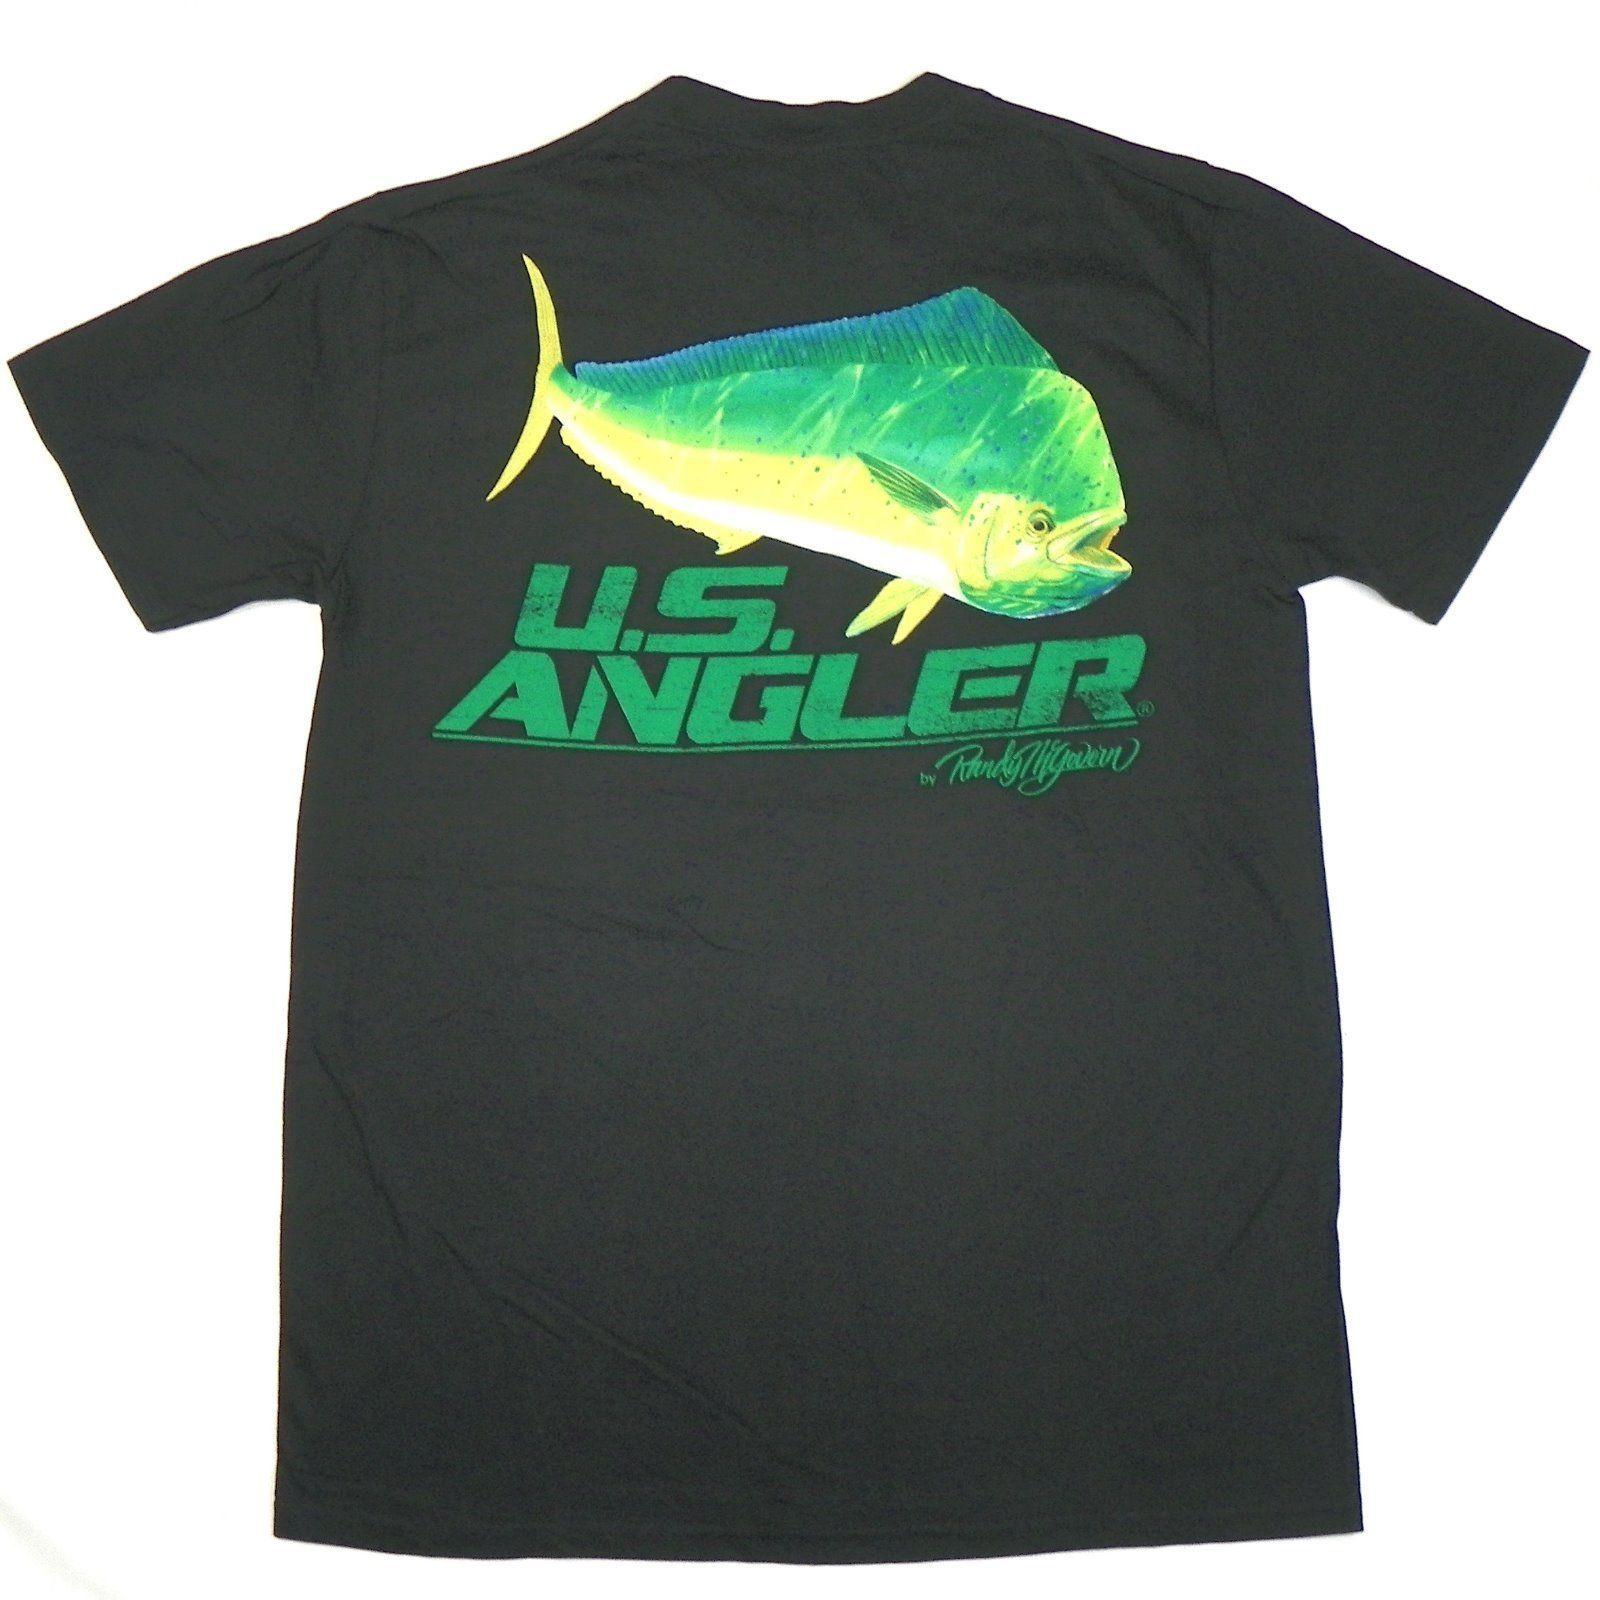 Men's U.S. Angler Shirt Fishing Tee Randy McGovern T-Shirt Green Fish Black